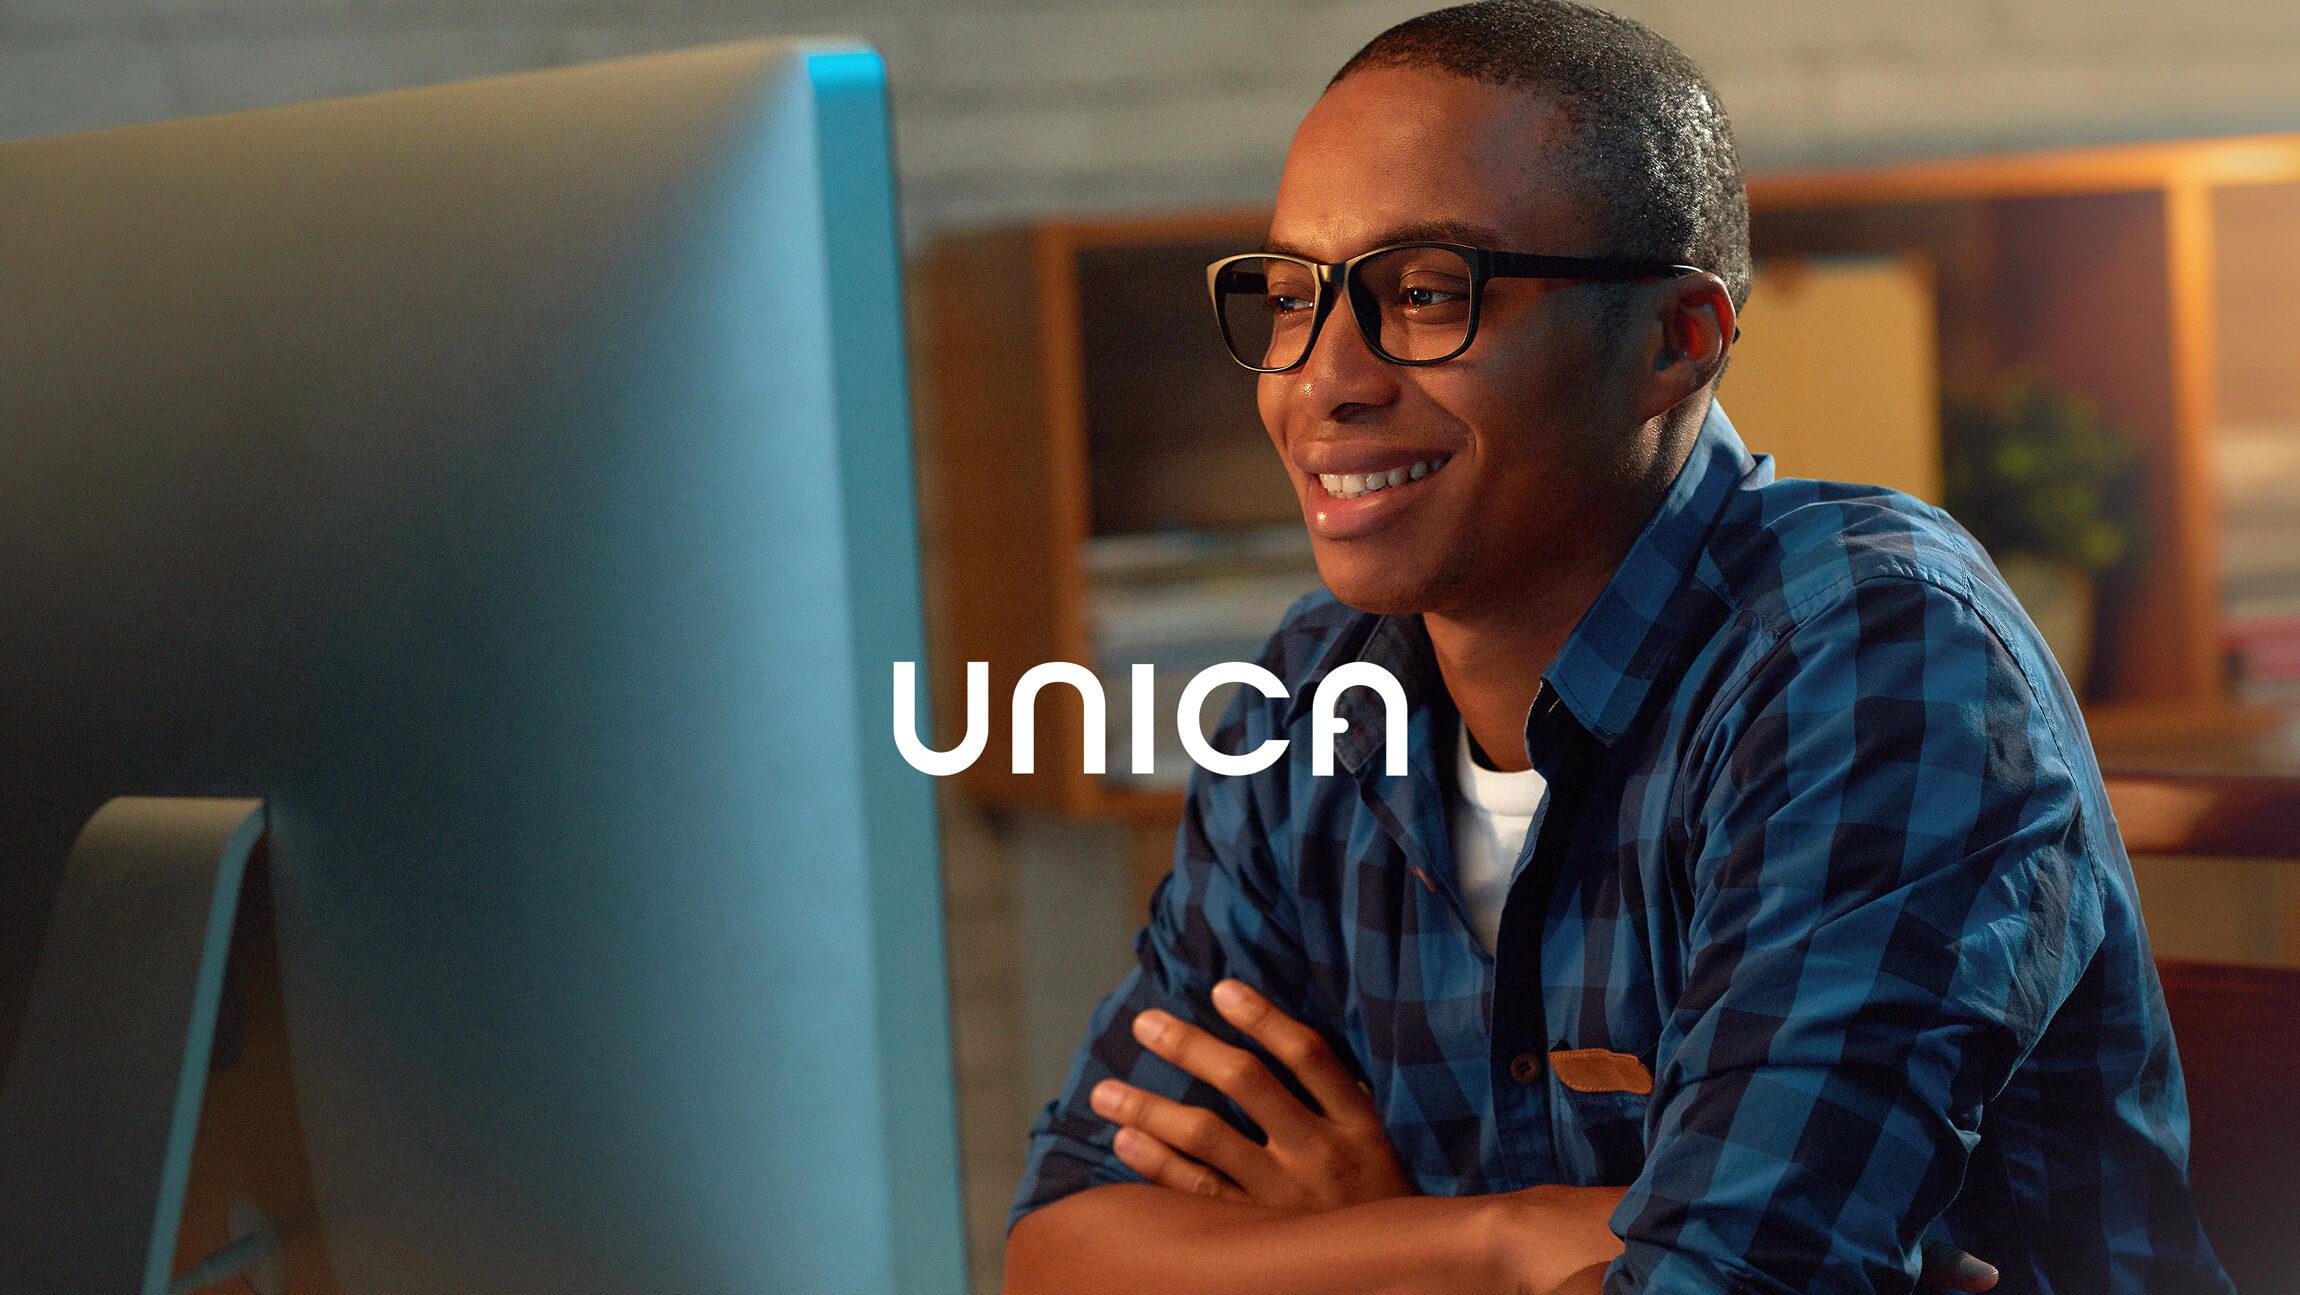 Visual Identity for Unica Education by Samuel Santos Design